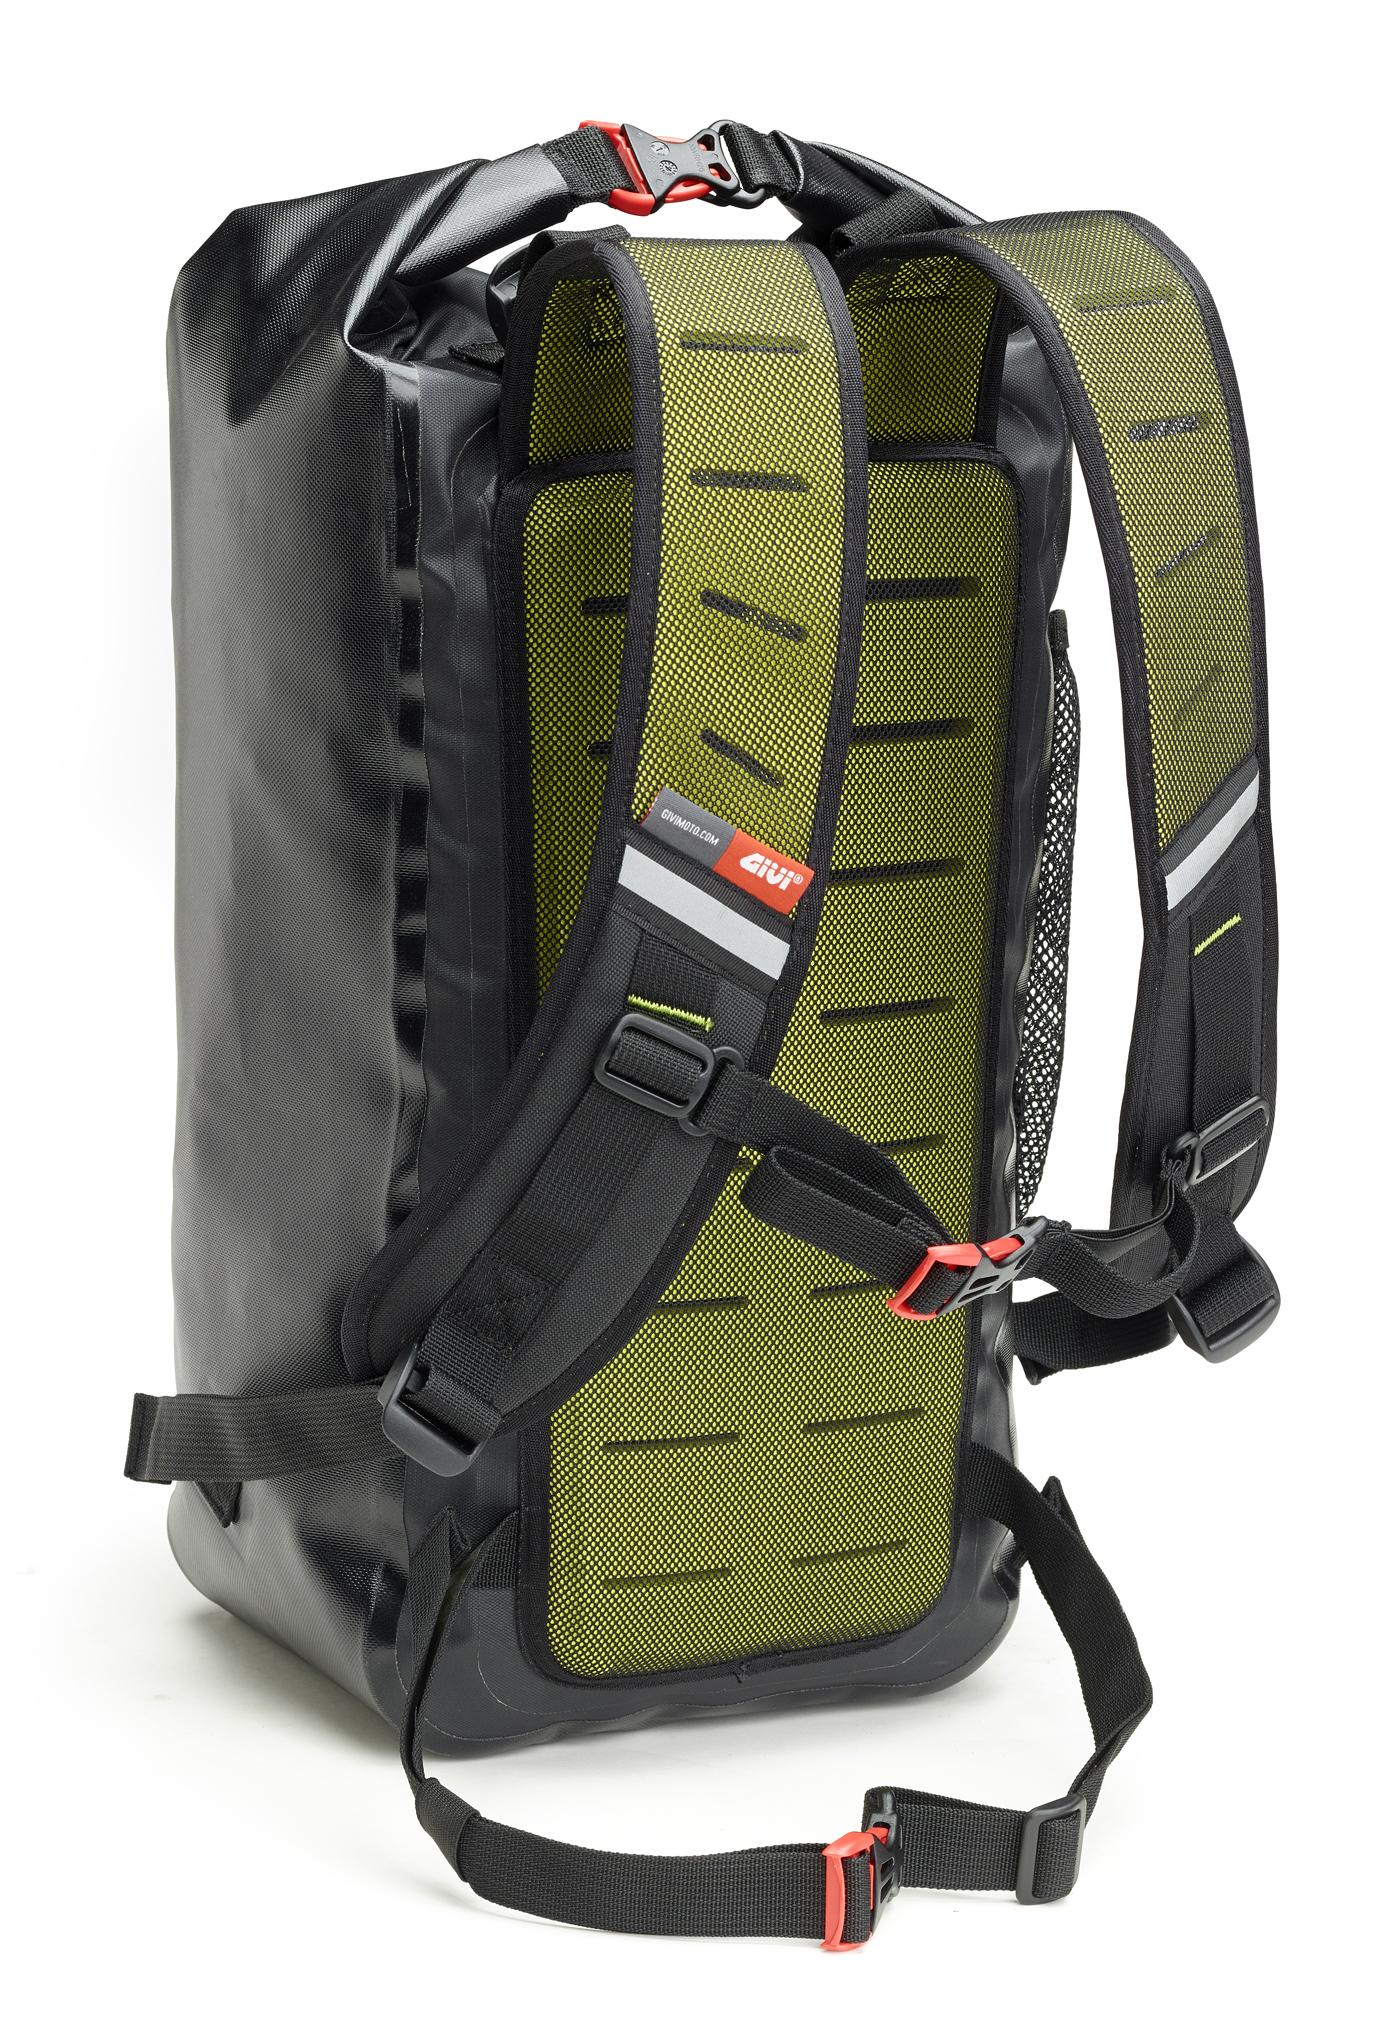 Givi Gravel-T GRT701 Waterproof Backpack 8ad40b044a28e